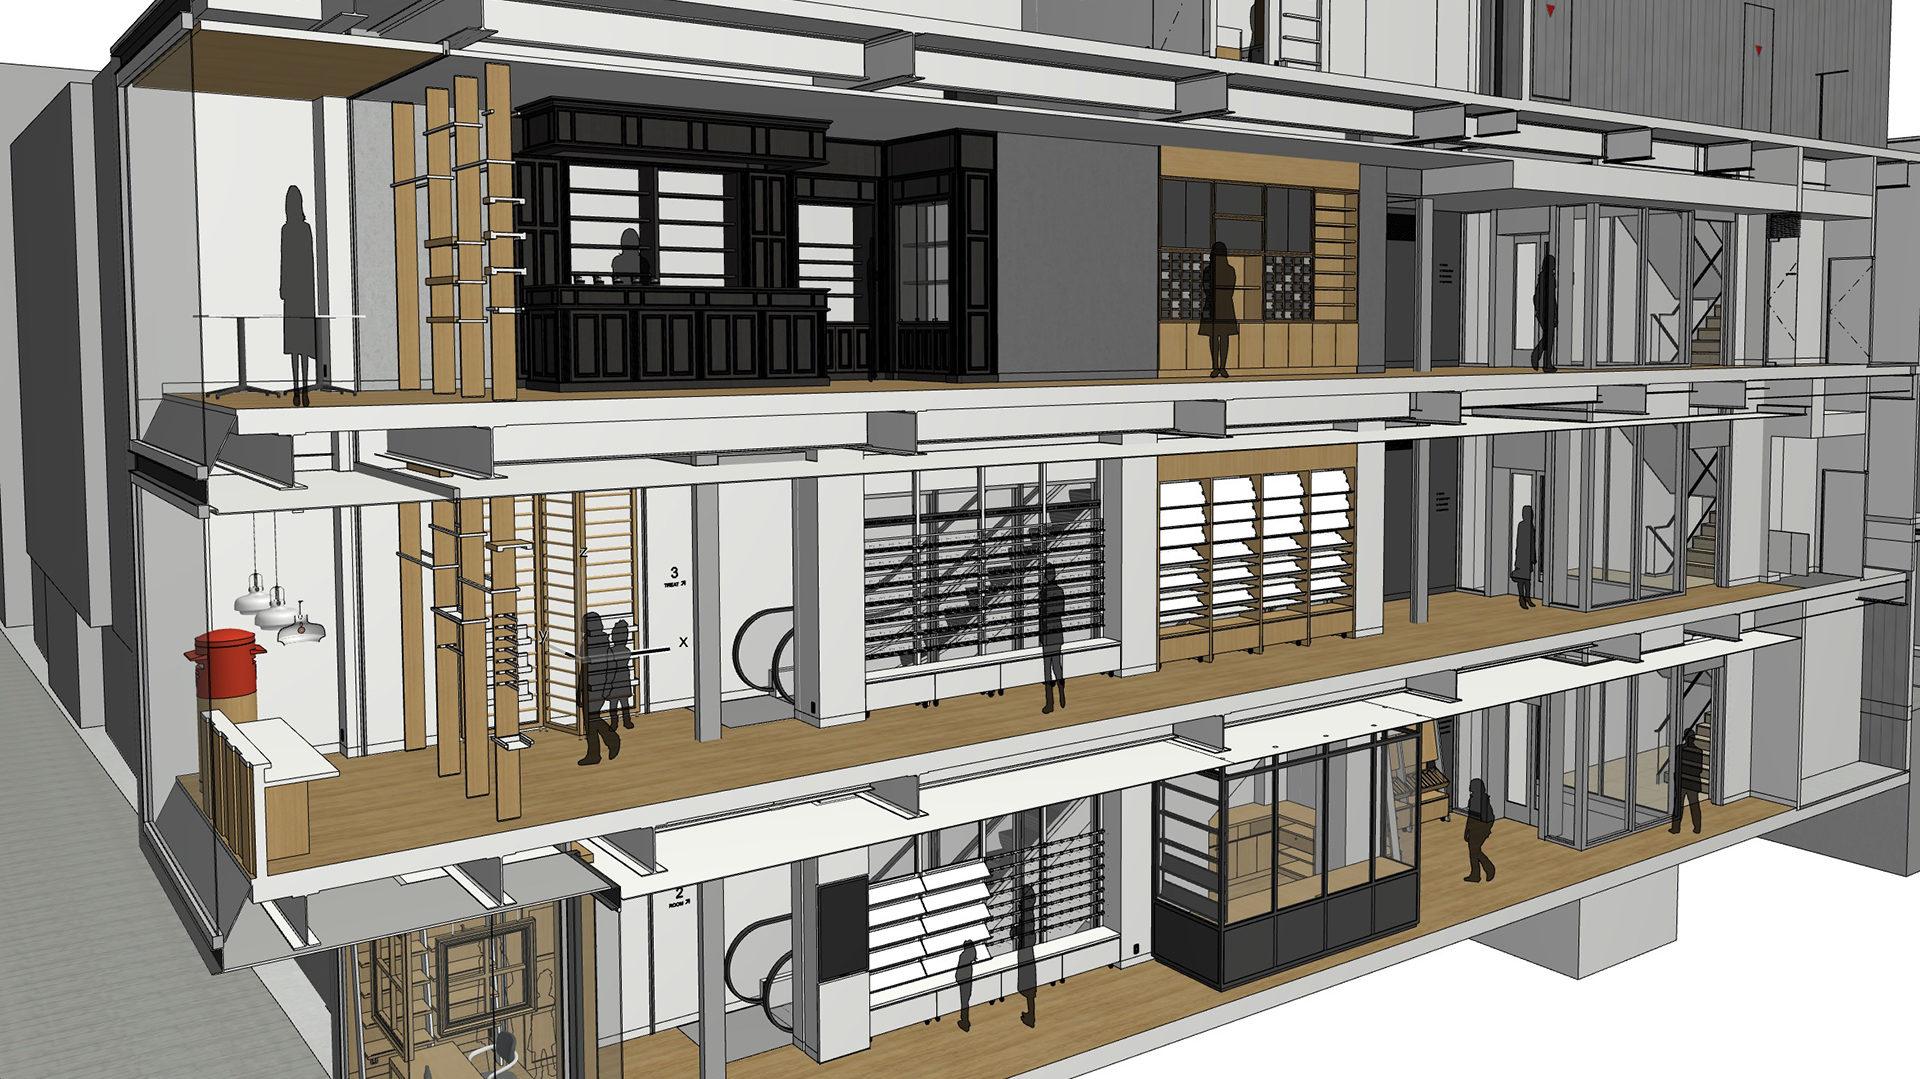 BIM(3Dモデル)により正確で迅速な設計フローを実現した銀座伊東屋横浜元町の断面パース画像